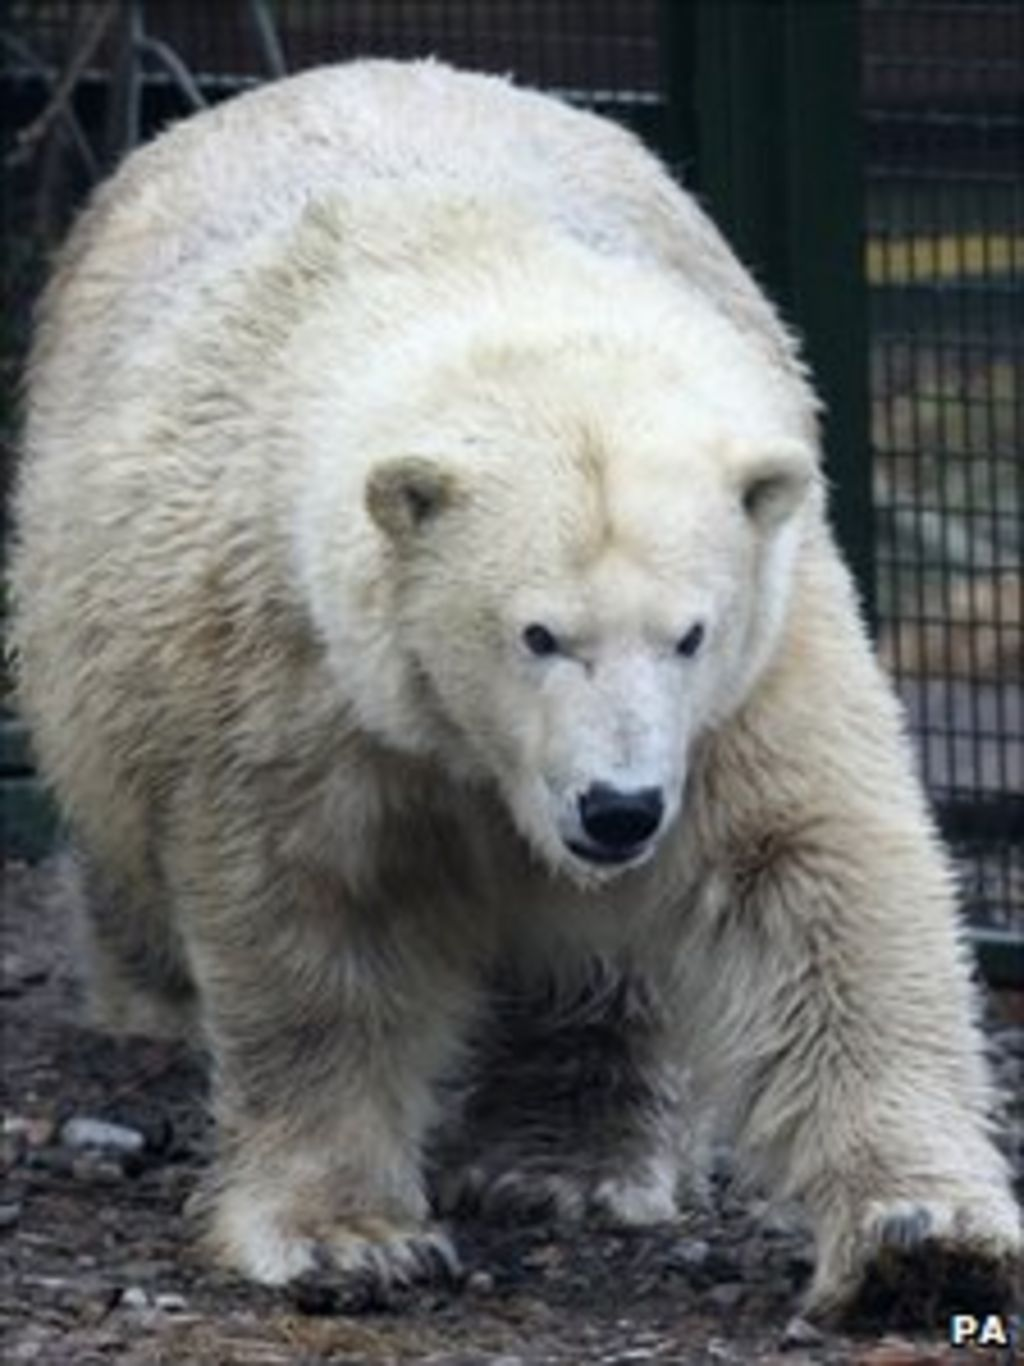 Polar bear mercedes 39 s health 39 failing 39 bbc news for Mercedes benz bear